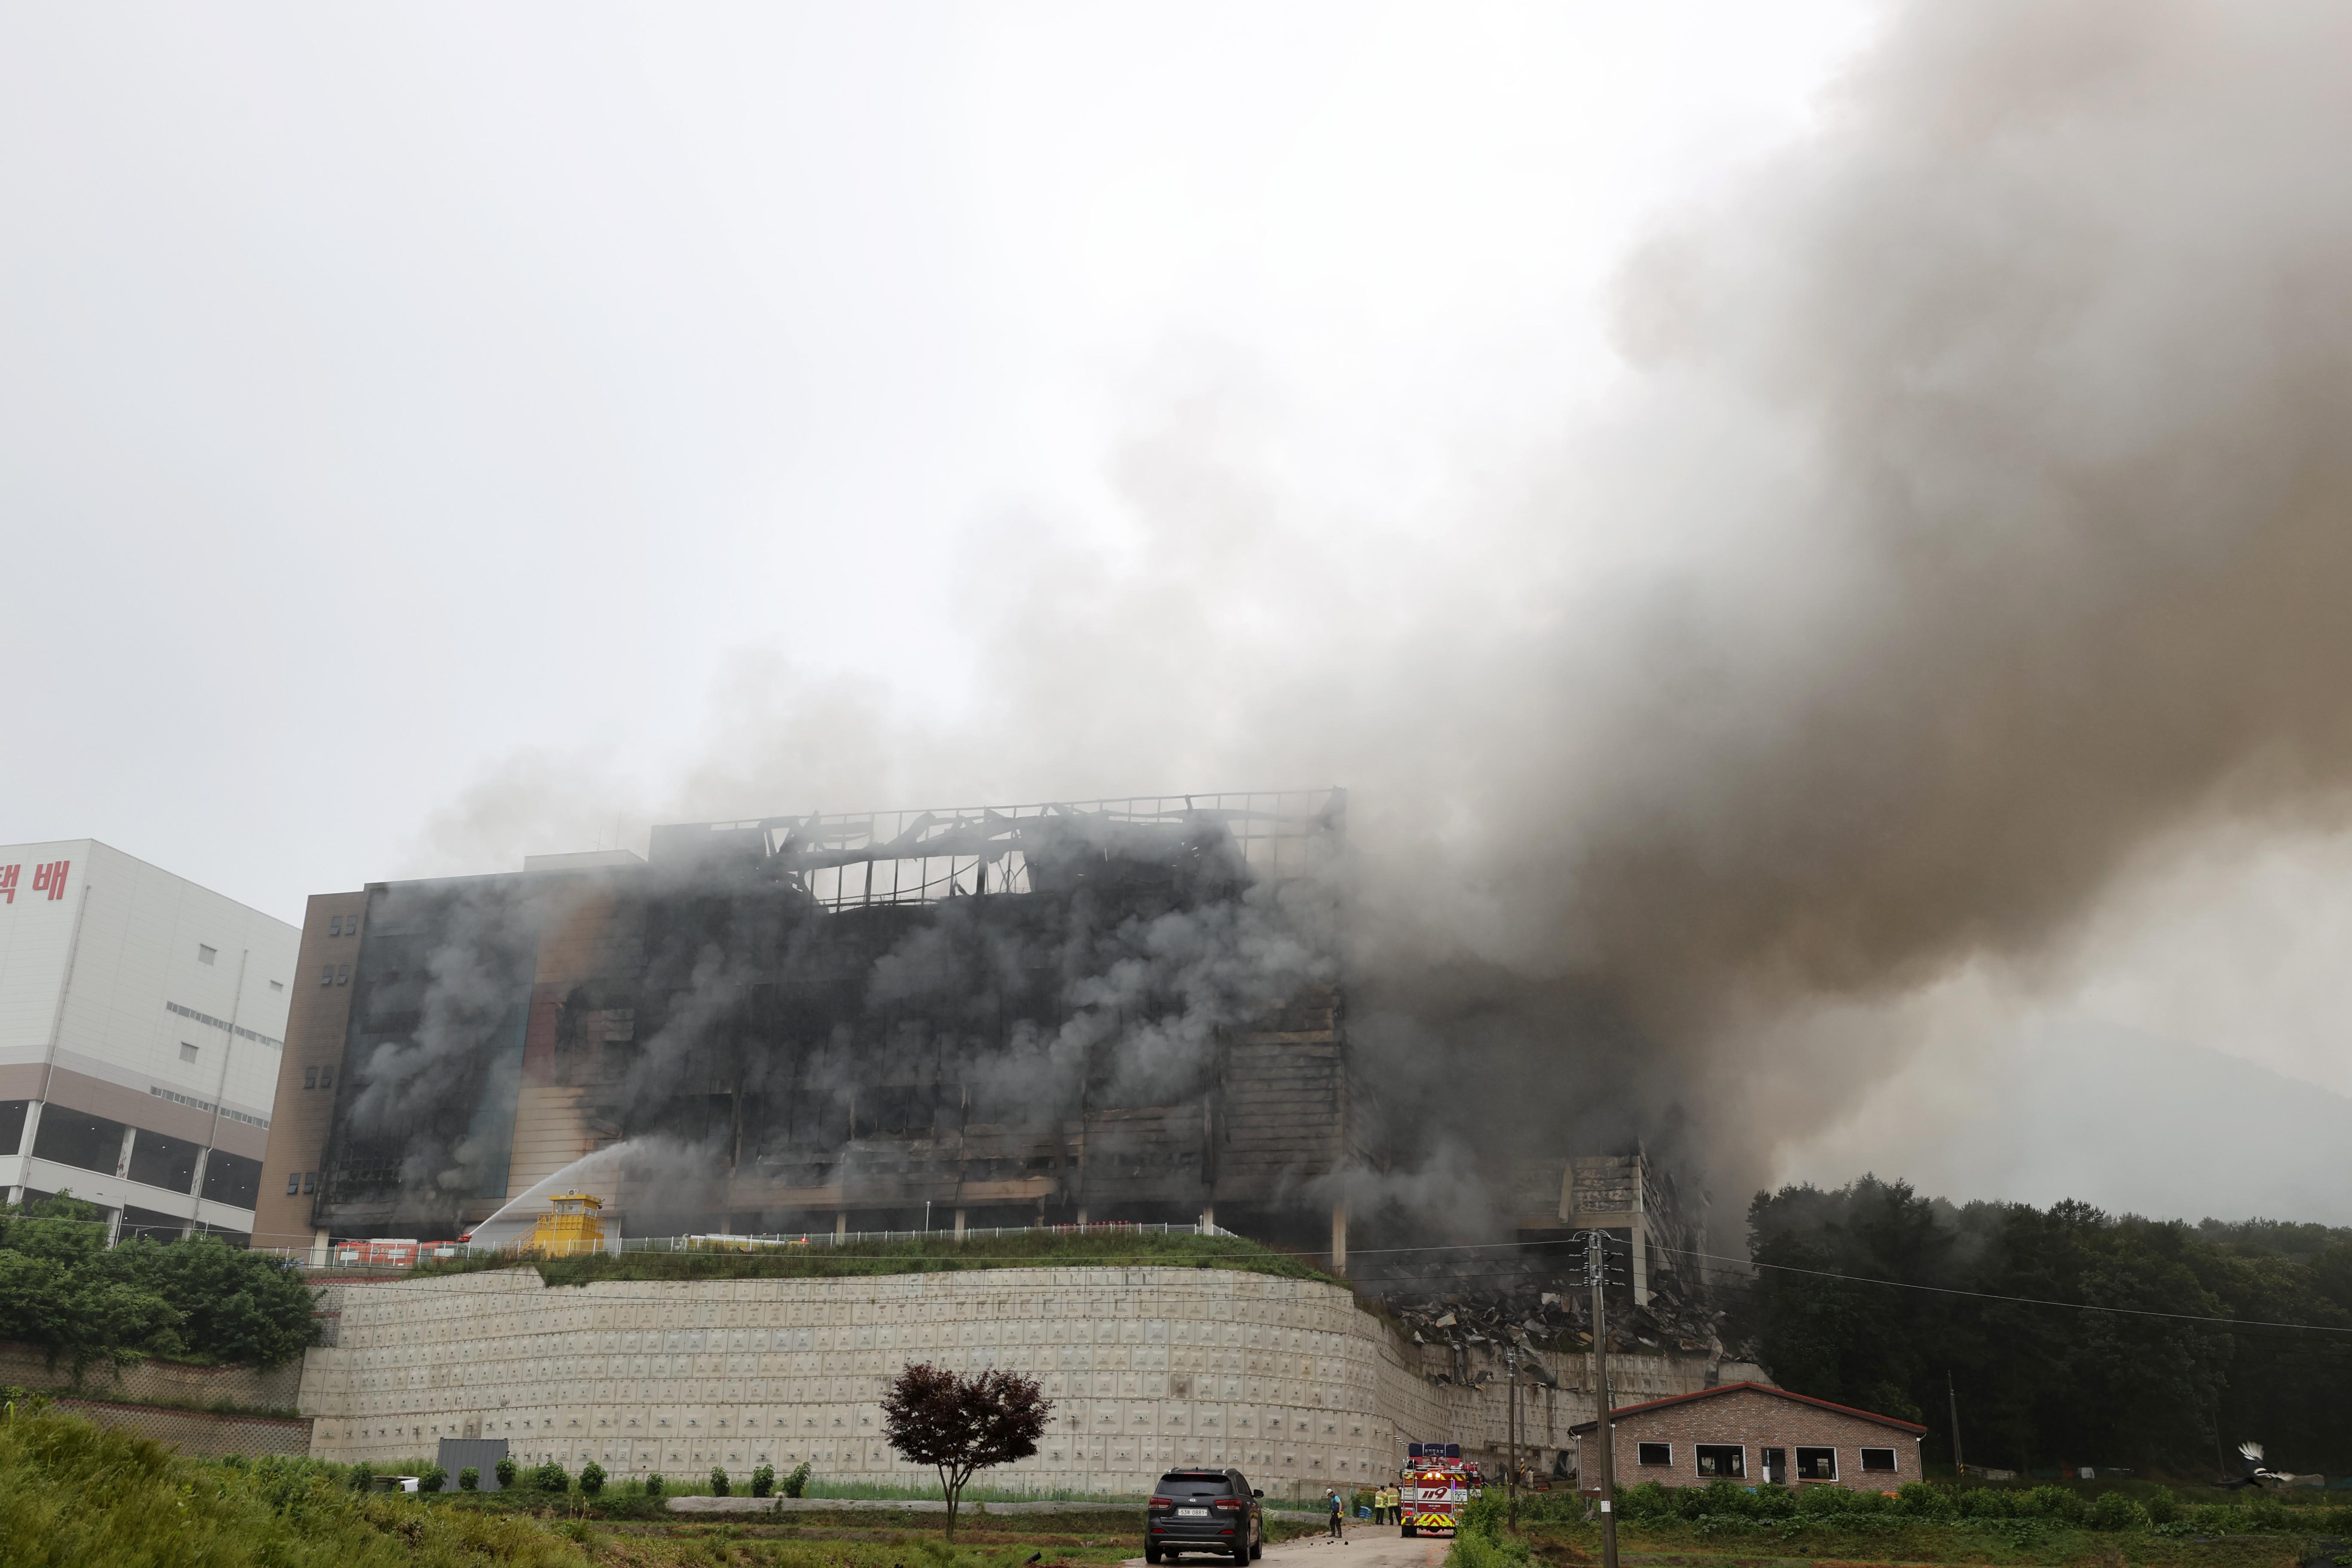 ▲▼Coupang位於京畿道利川的物流中心發生嚴重大火,一名消防員救災時受困,不幸殉職。(圖/志影像/newscom)